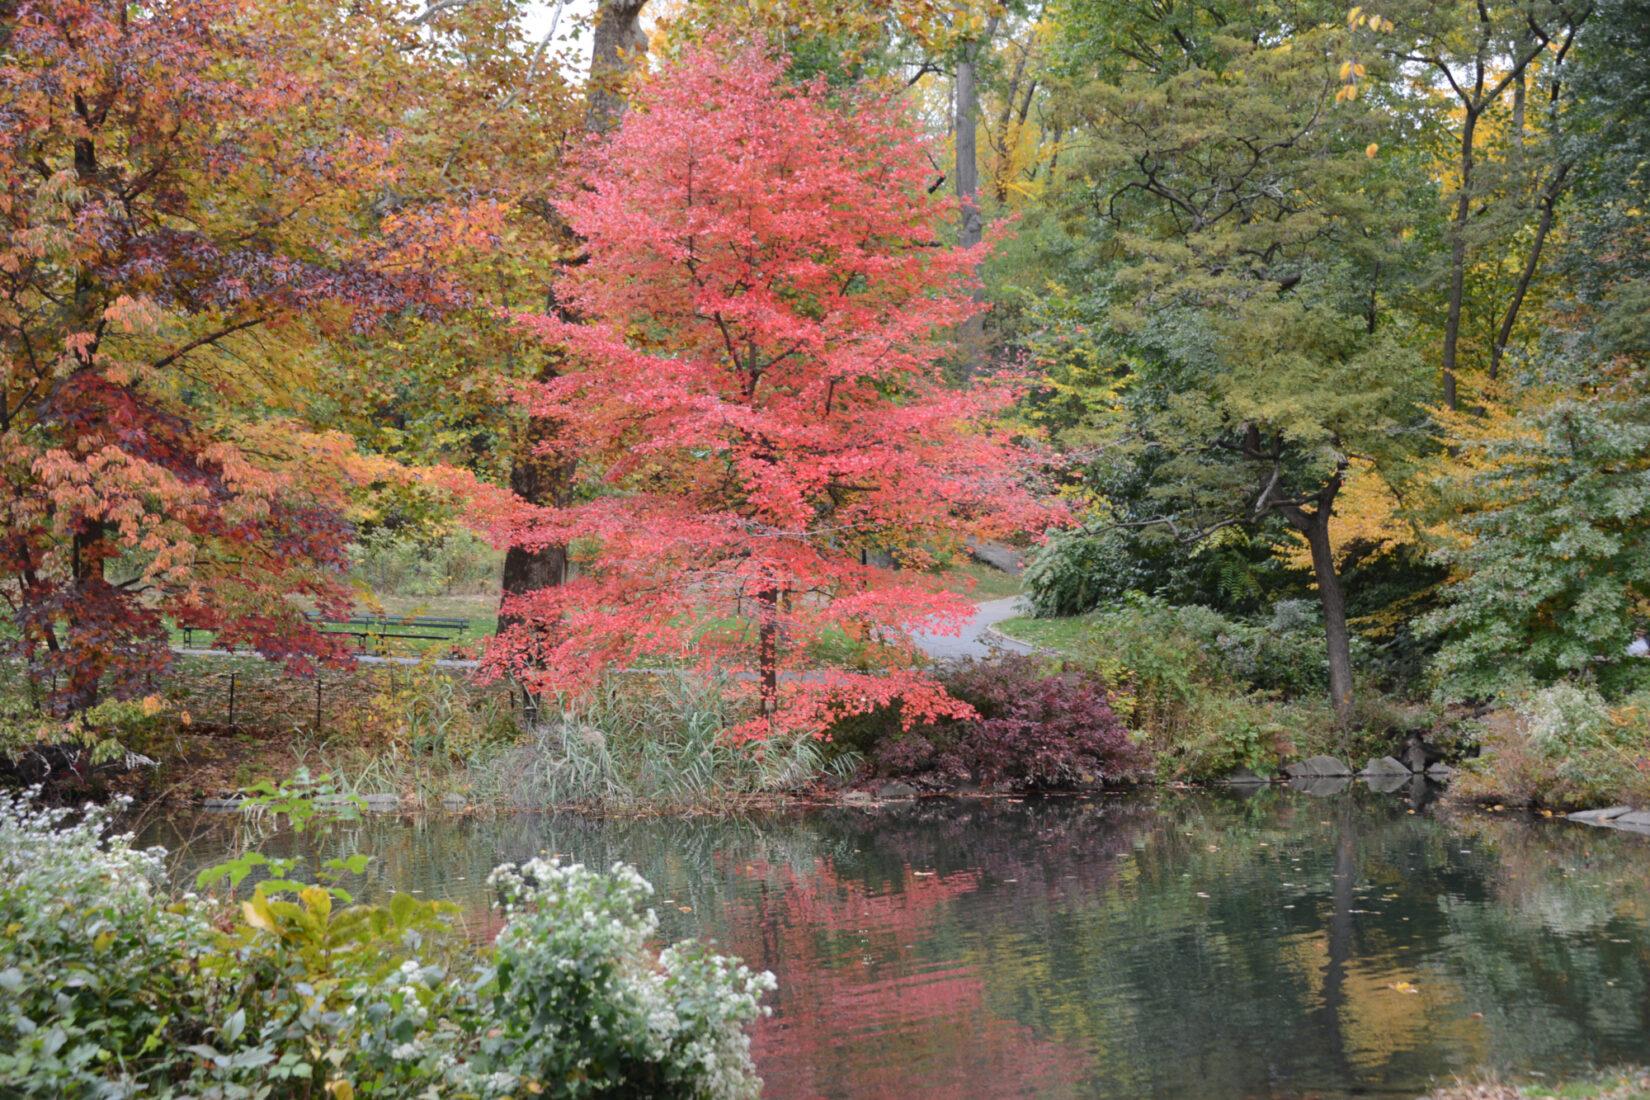 A tupelo tree ablaze in full fall color